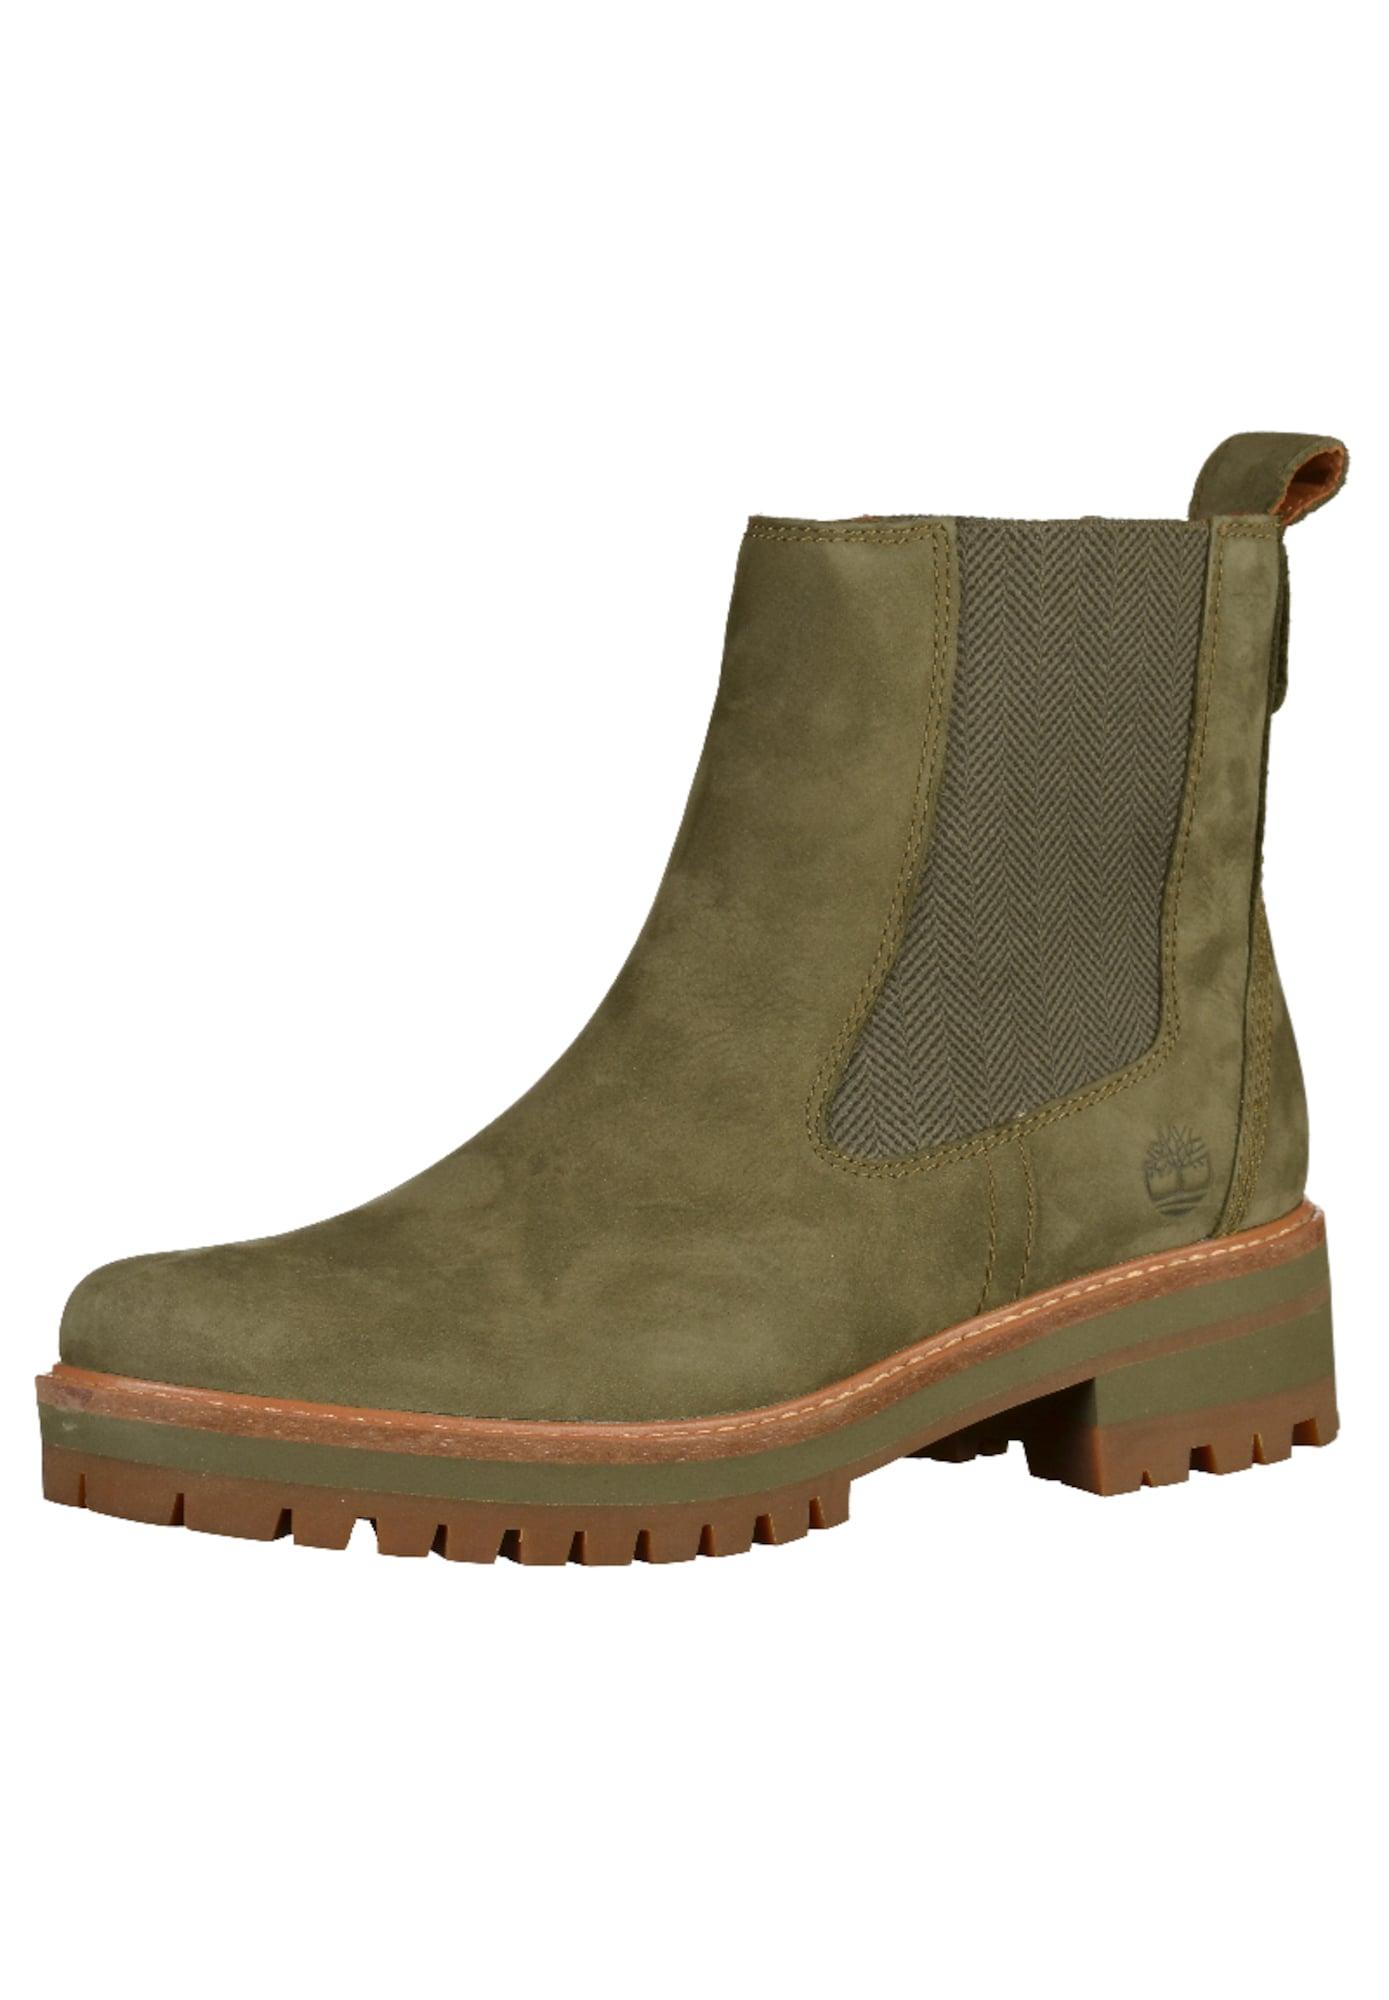 Chelsea-Boots 'Courmayeur Valley' | Schuhe > Boots > Chelsea-Boots | Timberland